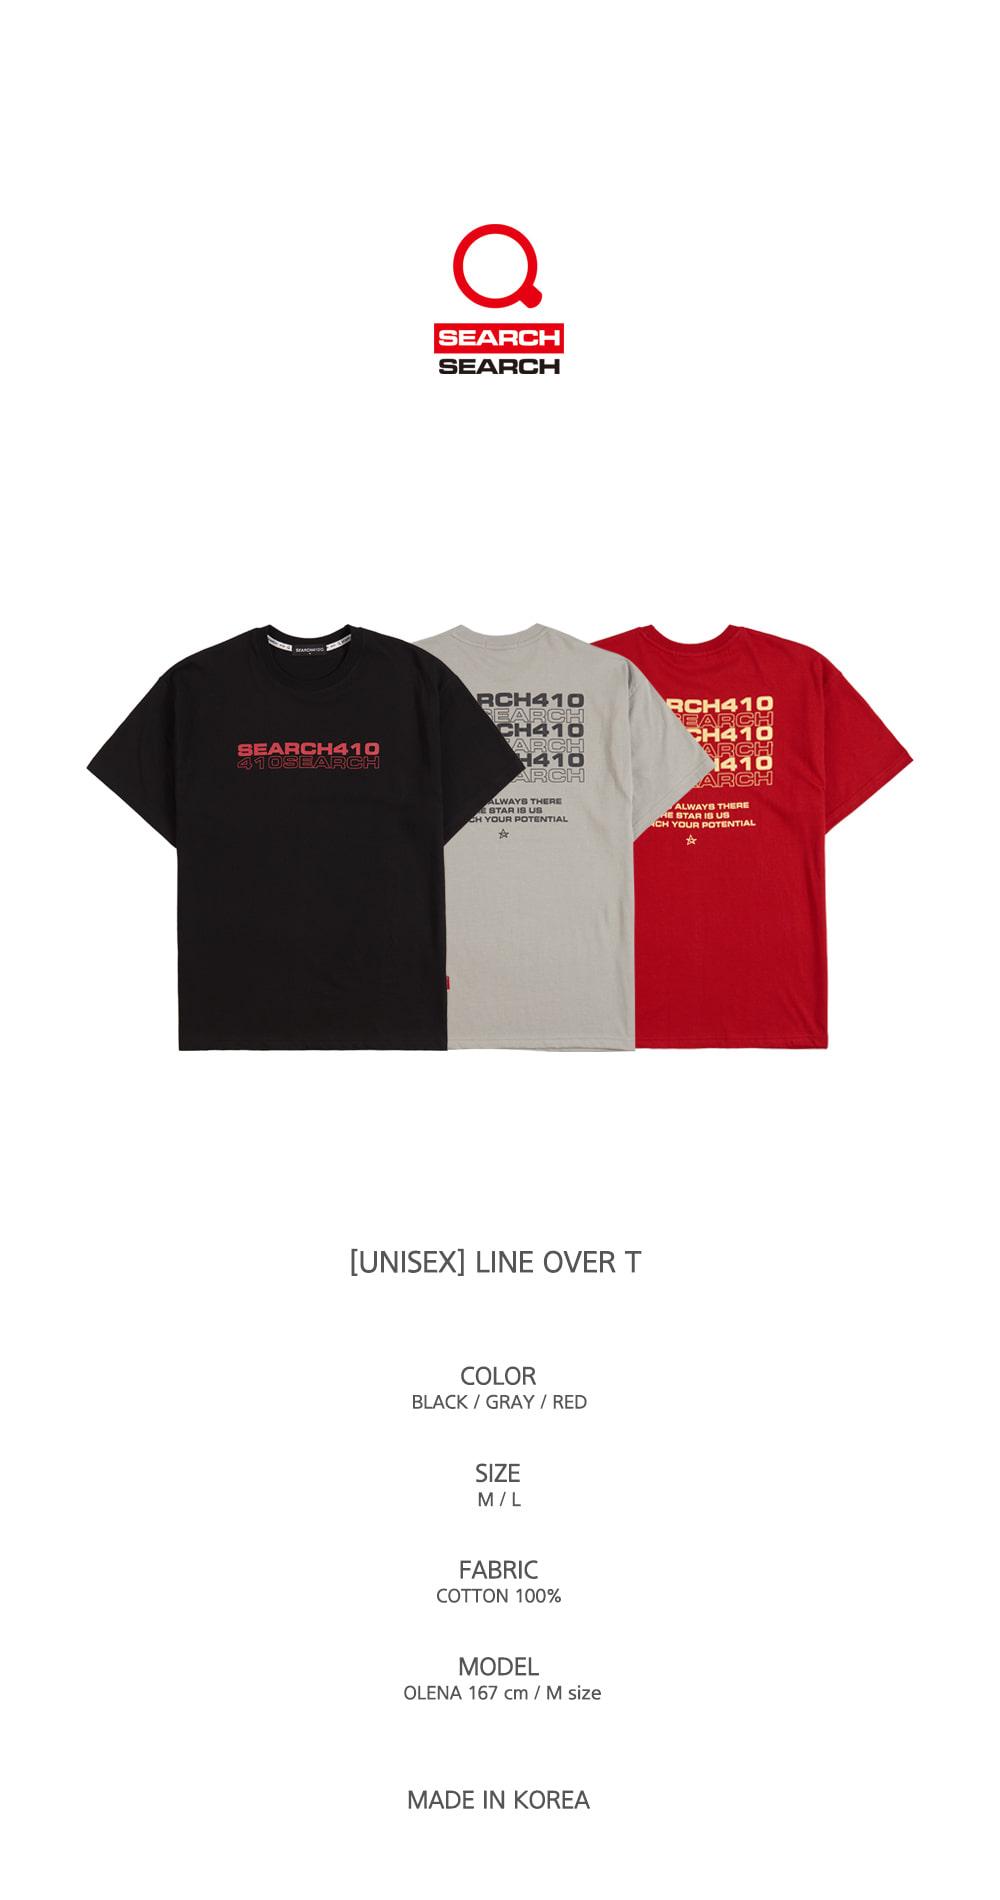 [UNISEX] LINE OVER T_GRAY